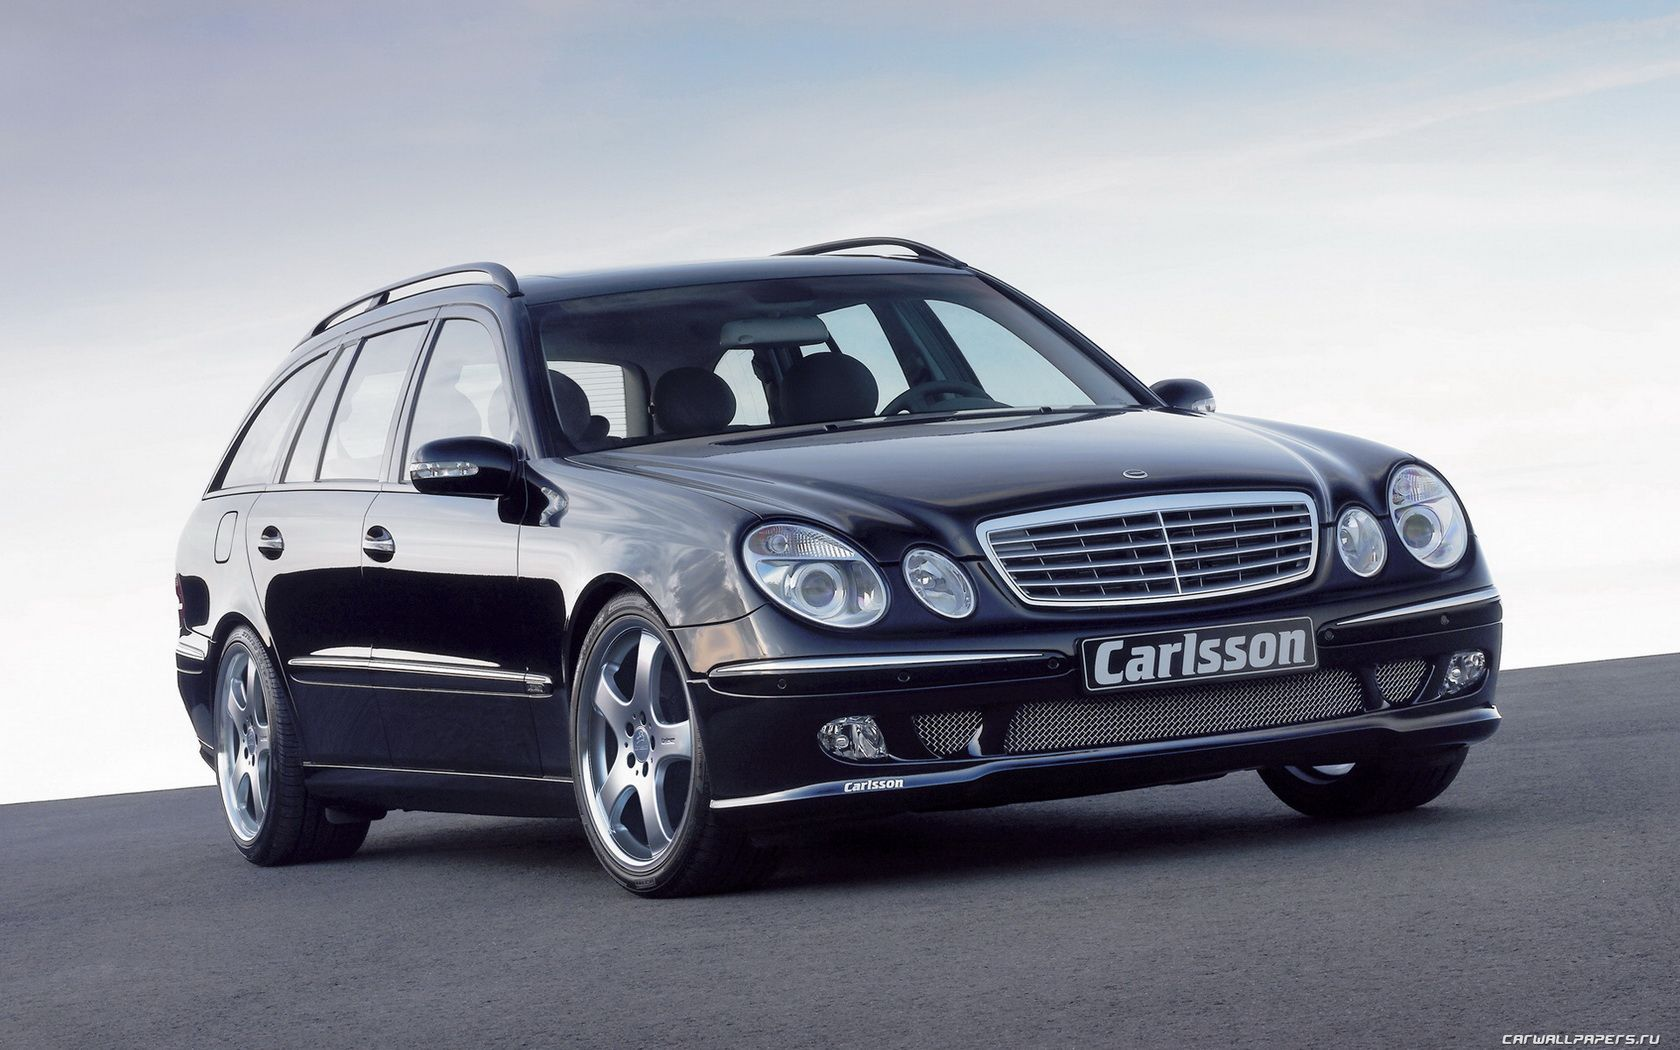 Carlsson Mercedes Benz E Class Wagon Mercedes Benz Benz E Class Benz